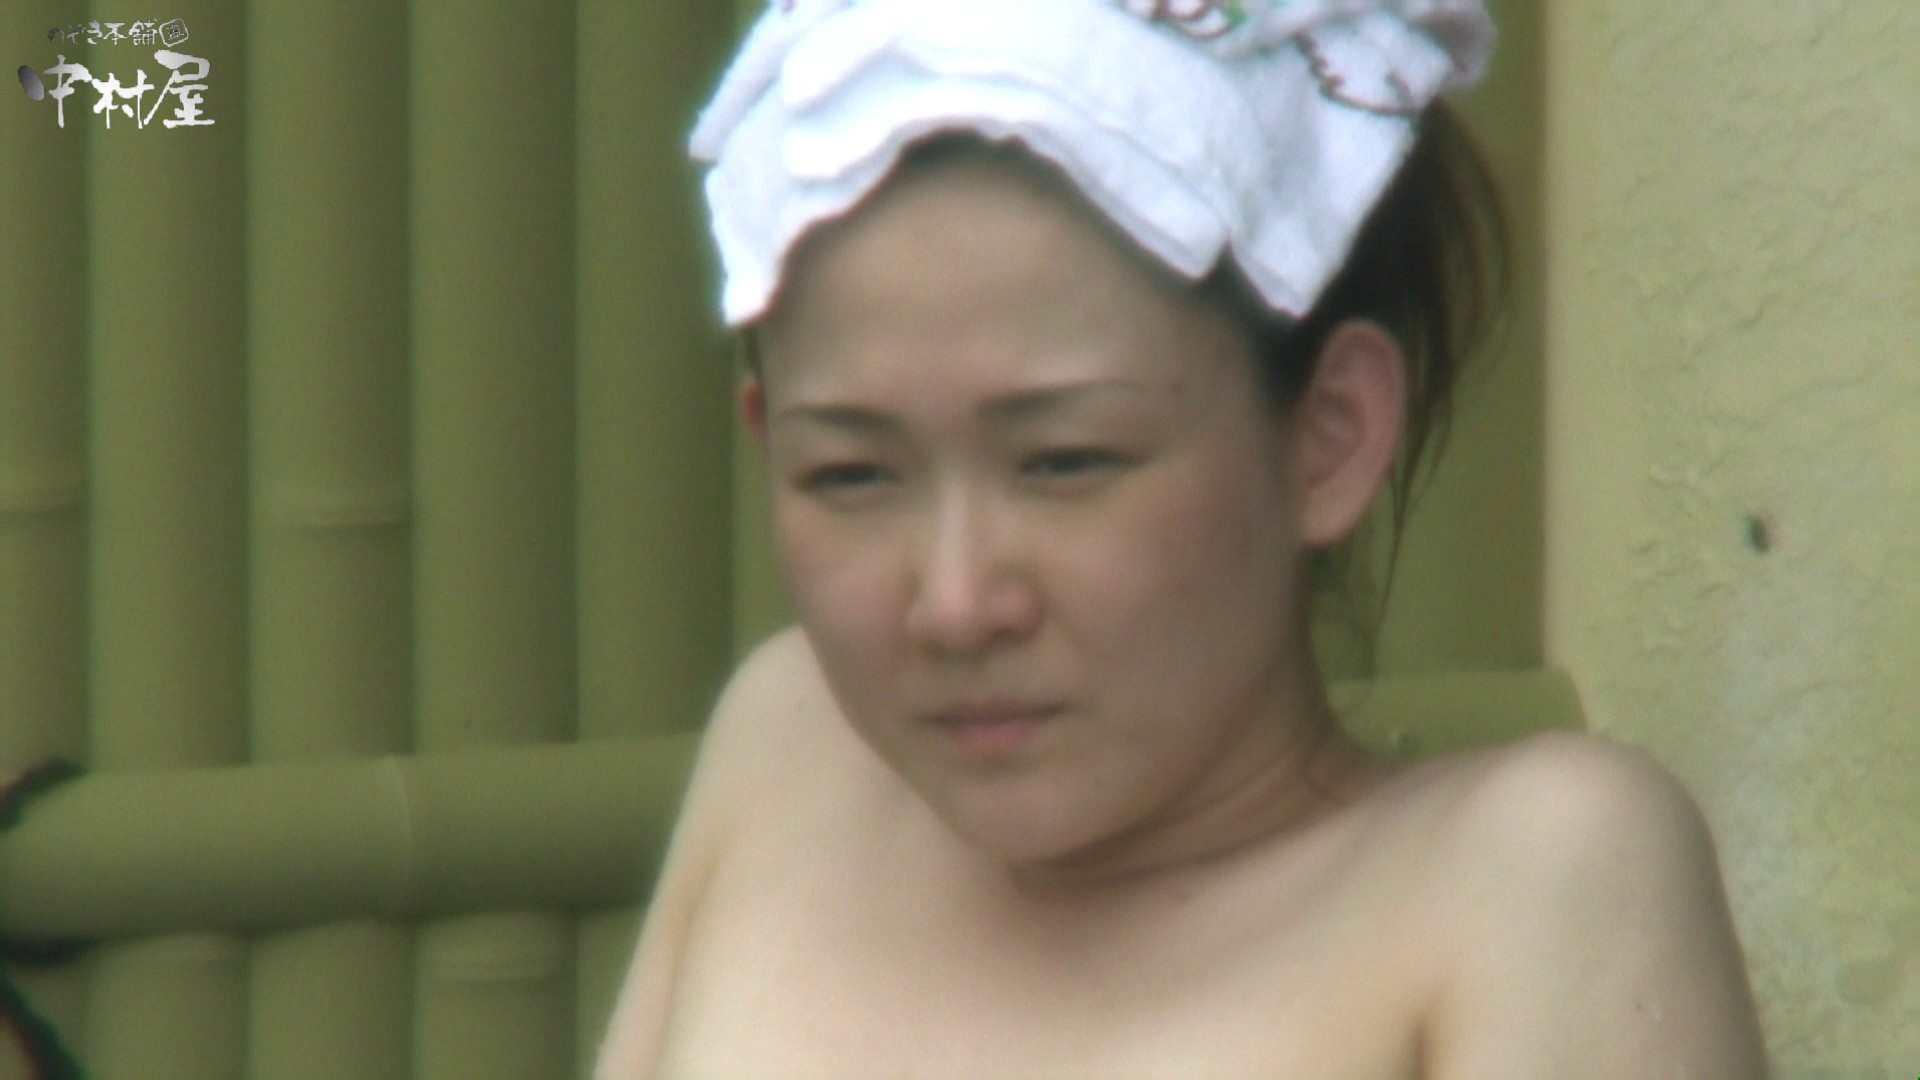 Aquaな露天風呂Vol.943 露天 | OLセックス  108画像 61